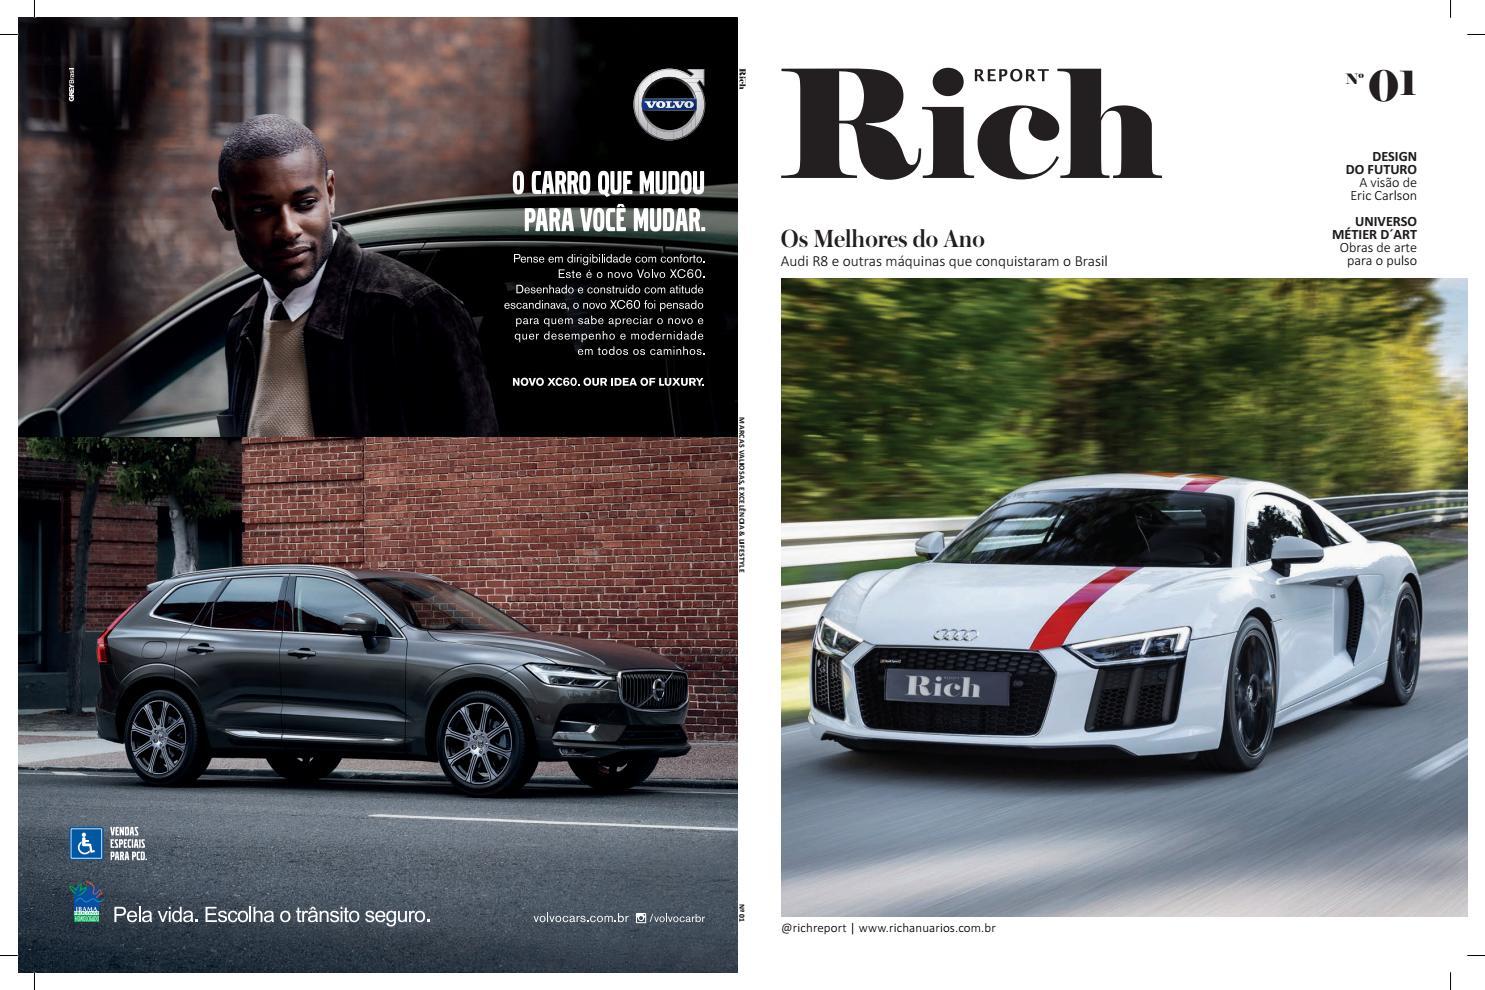 05c7334b6f4 Rich Report 01 by richreport - issuu